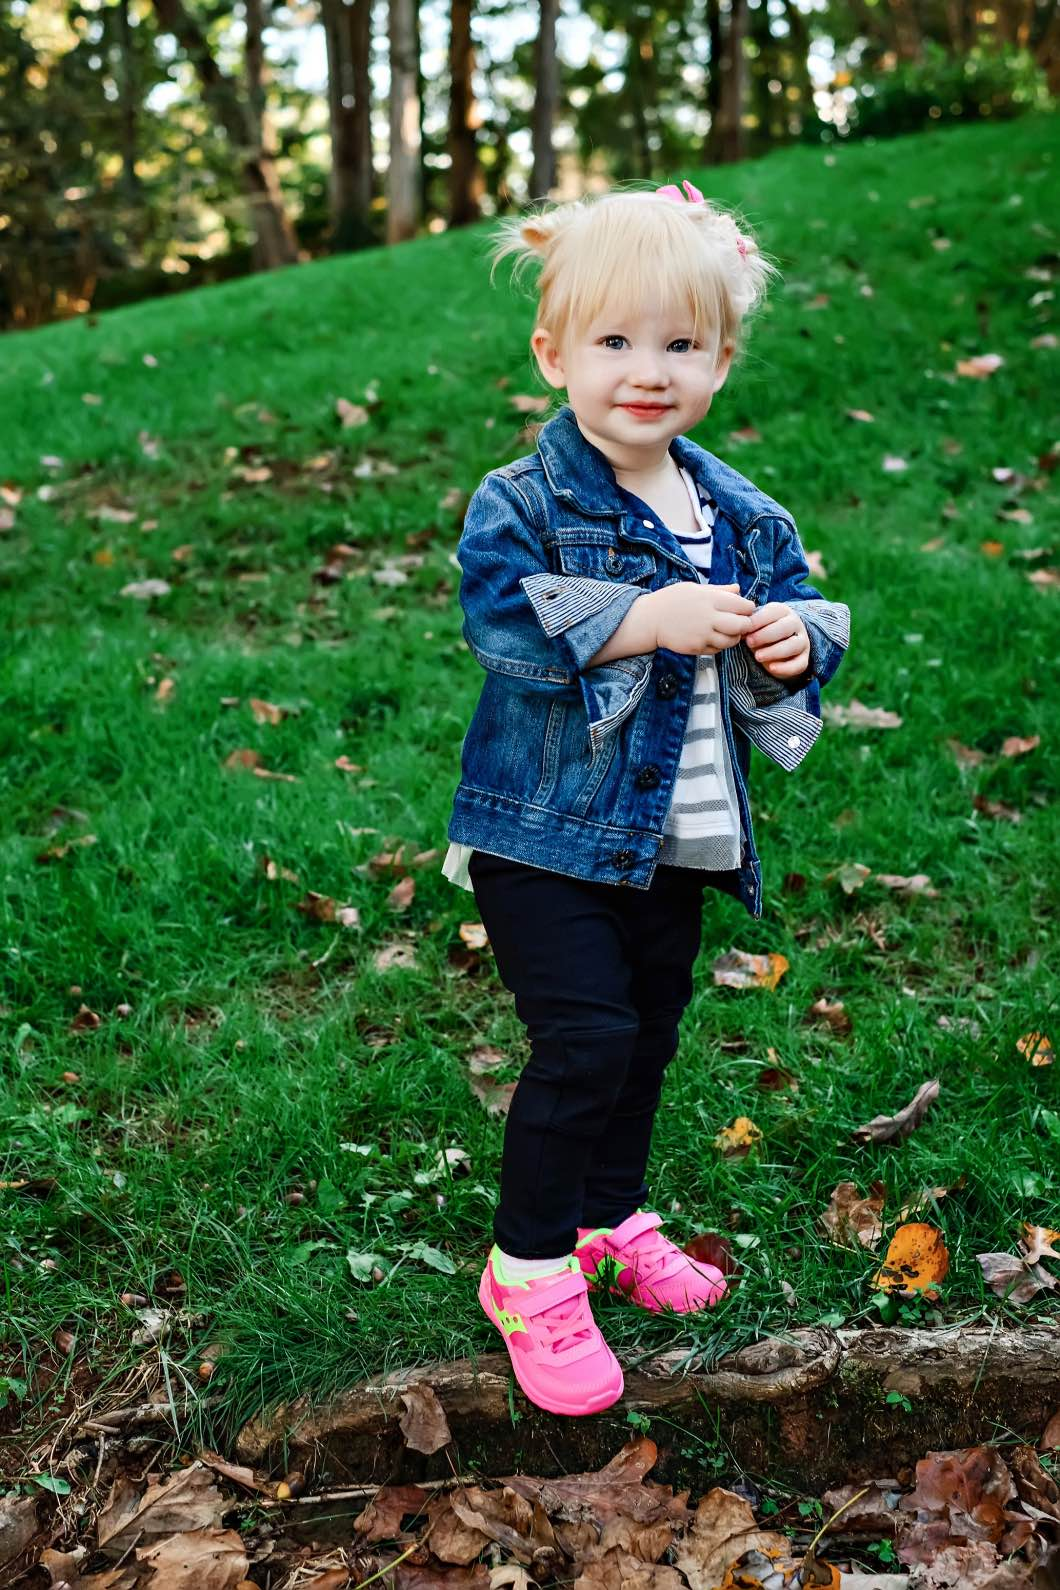 atlantachildmodelkidsshoes - Great Toddler Shoes for Girls by Atlanta mom blogger Happily Hughes